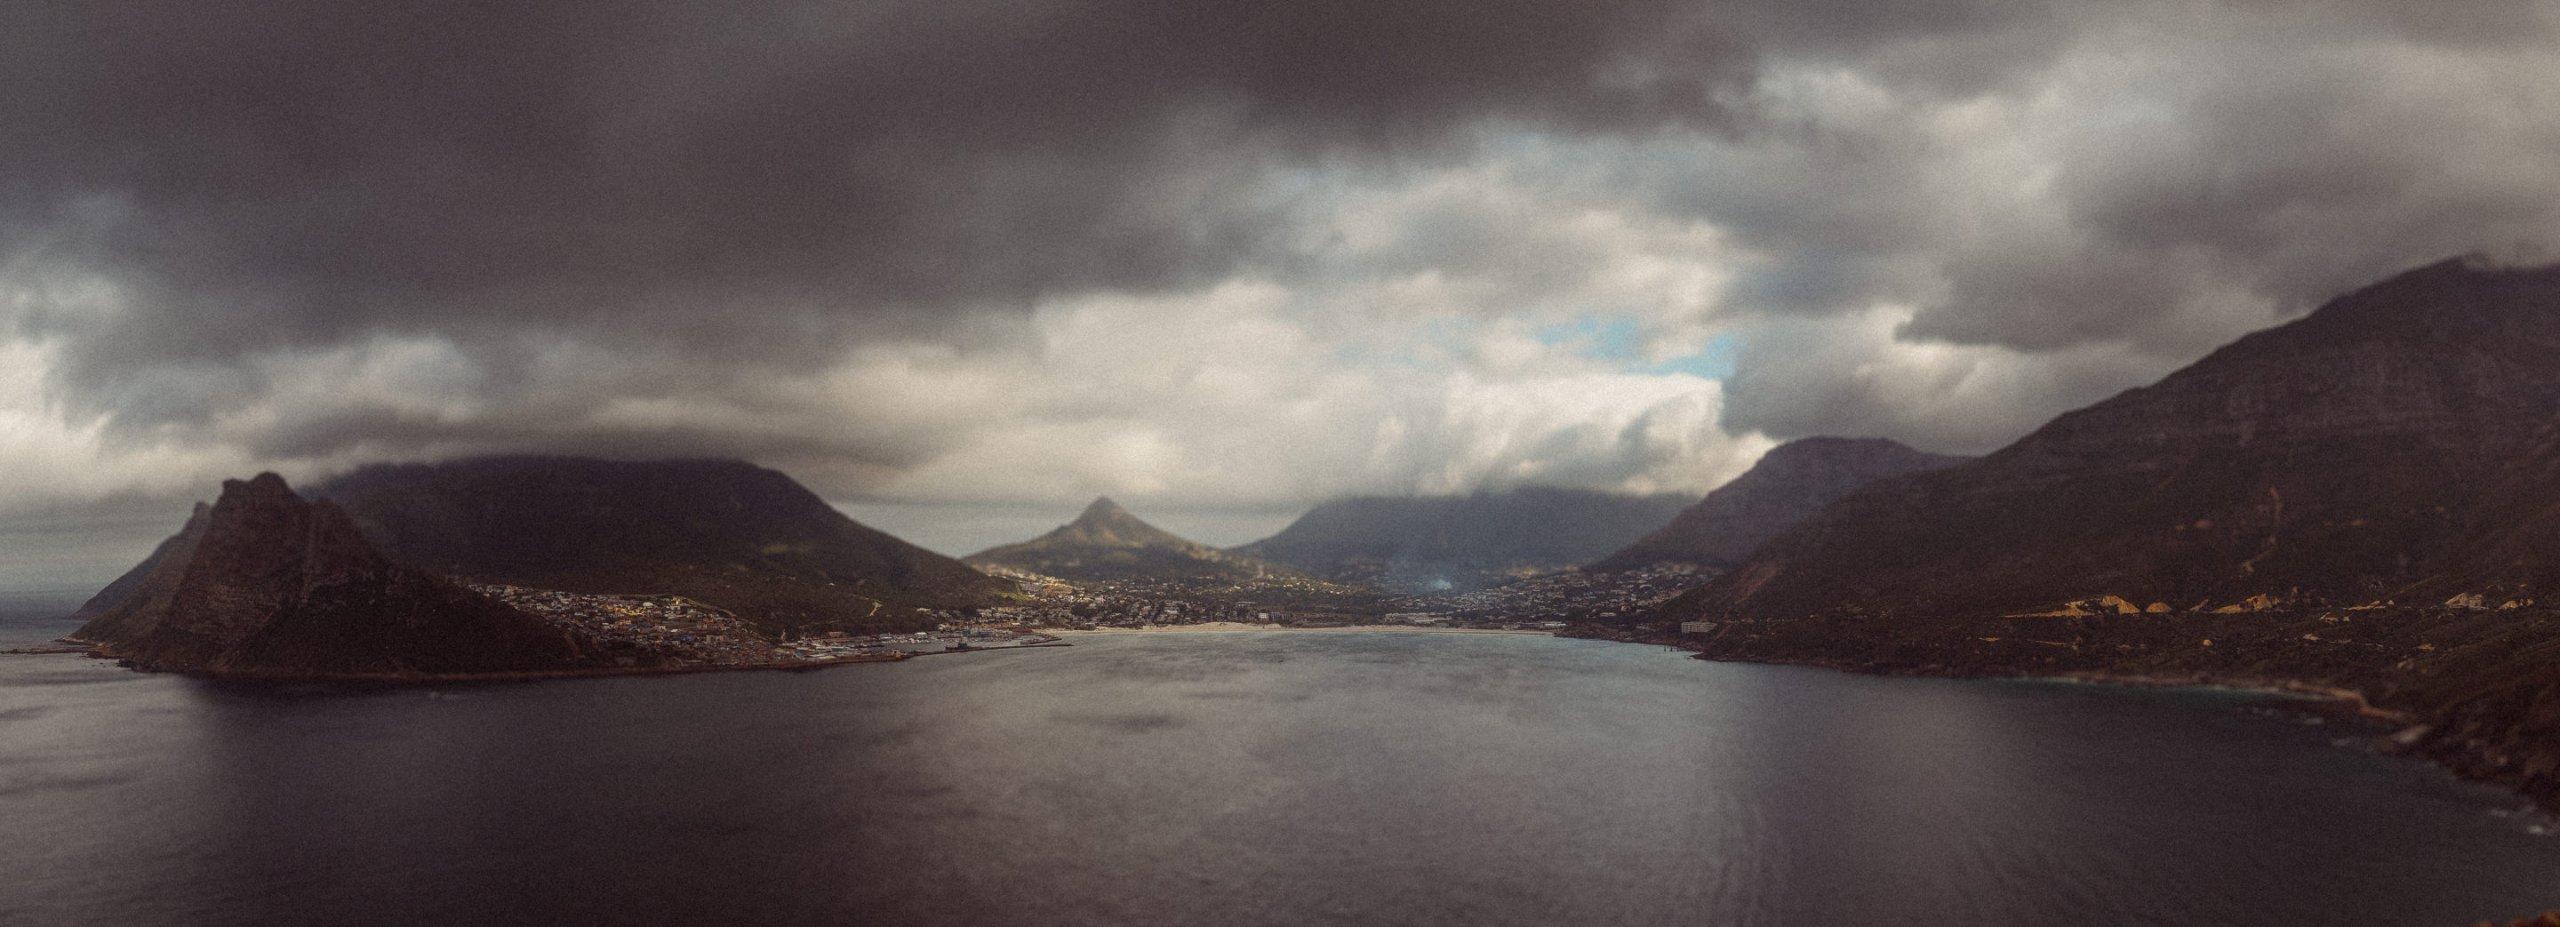 South Africa  Panorama